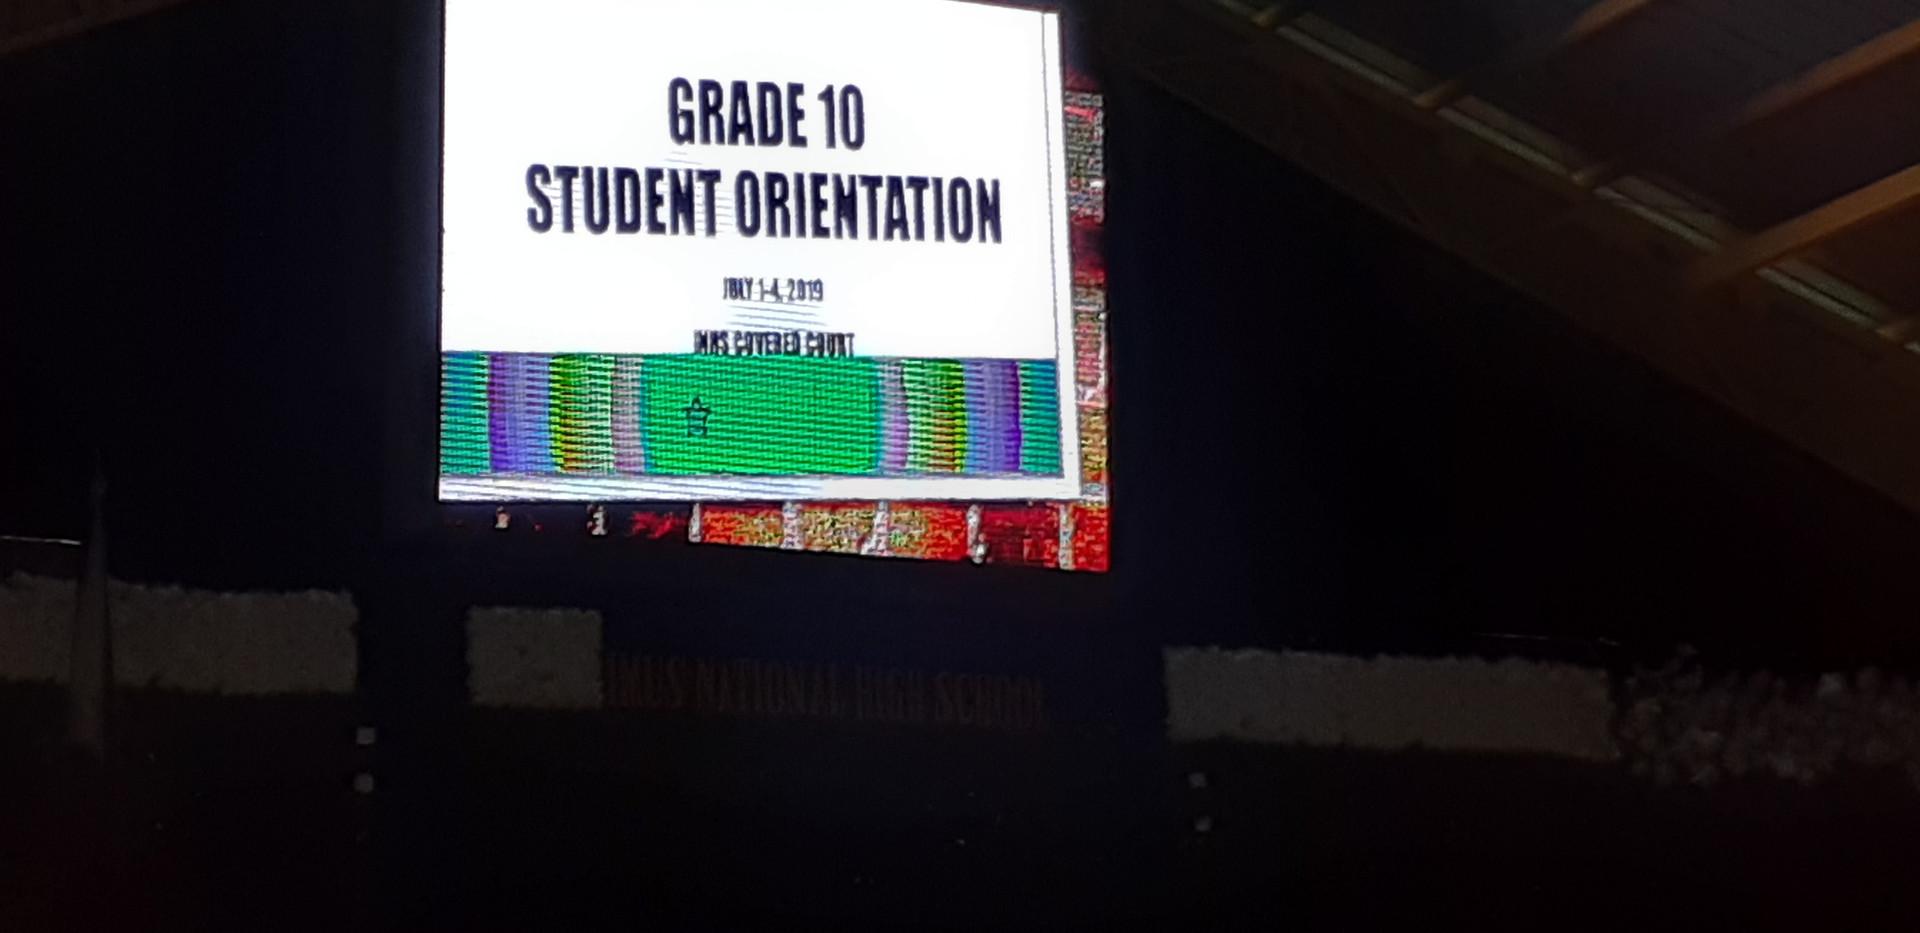 Grade 10 Student Orientation